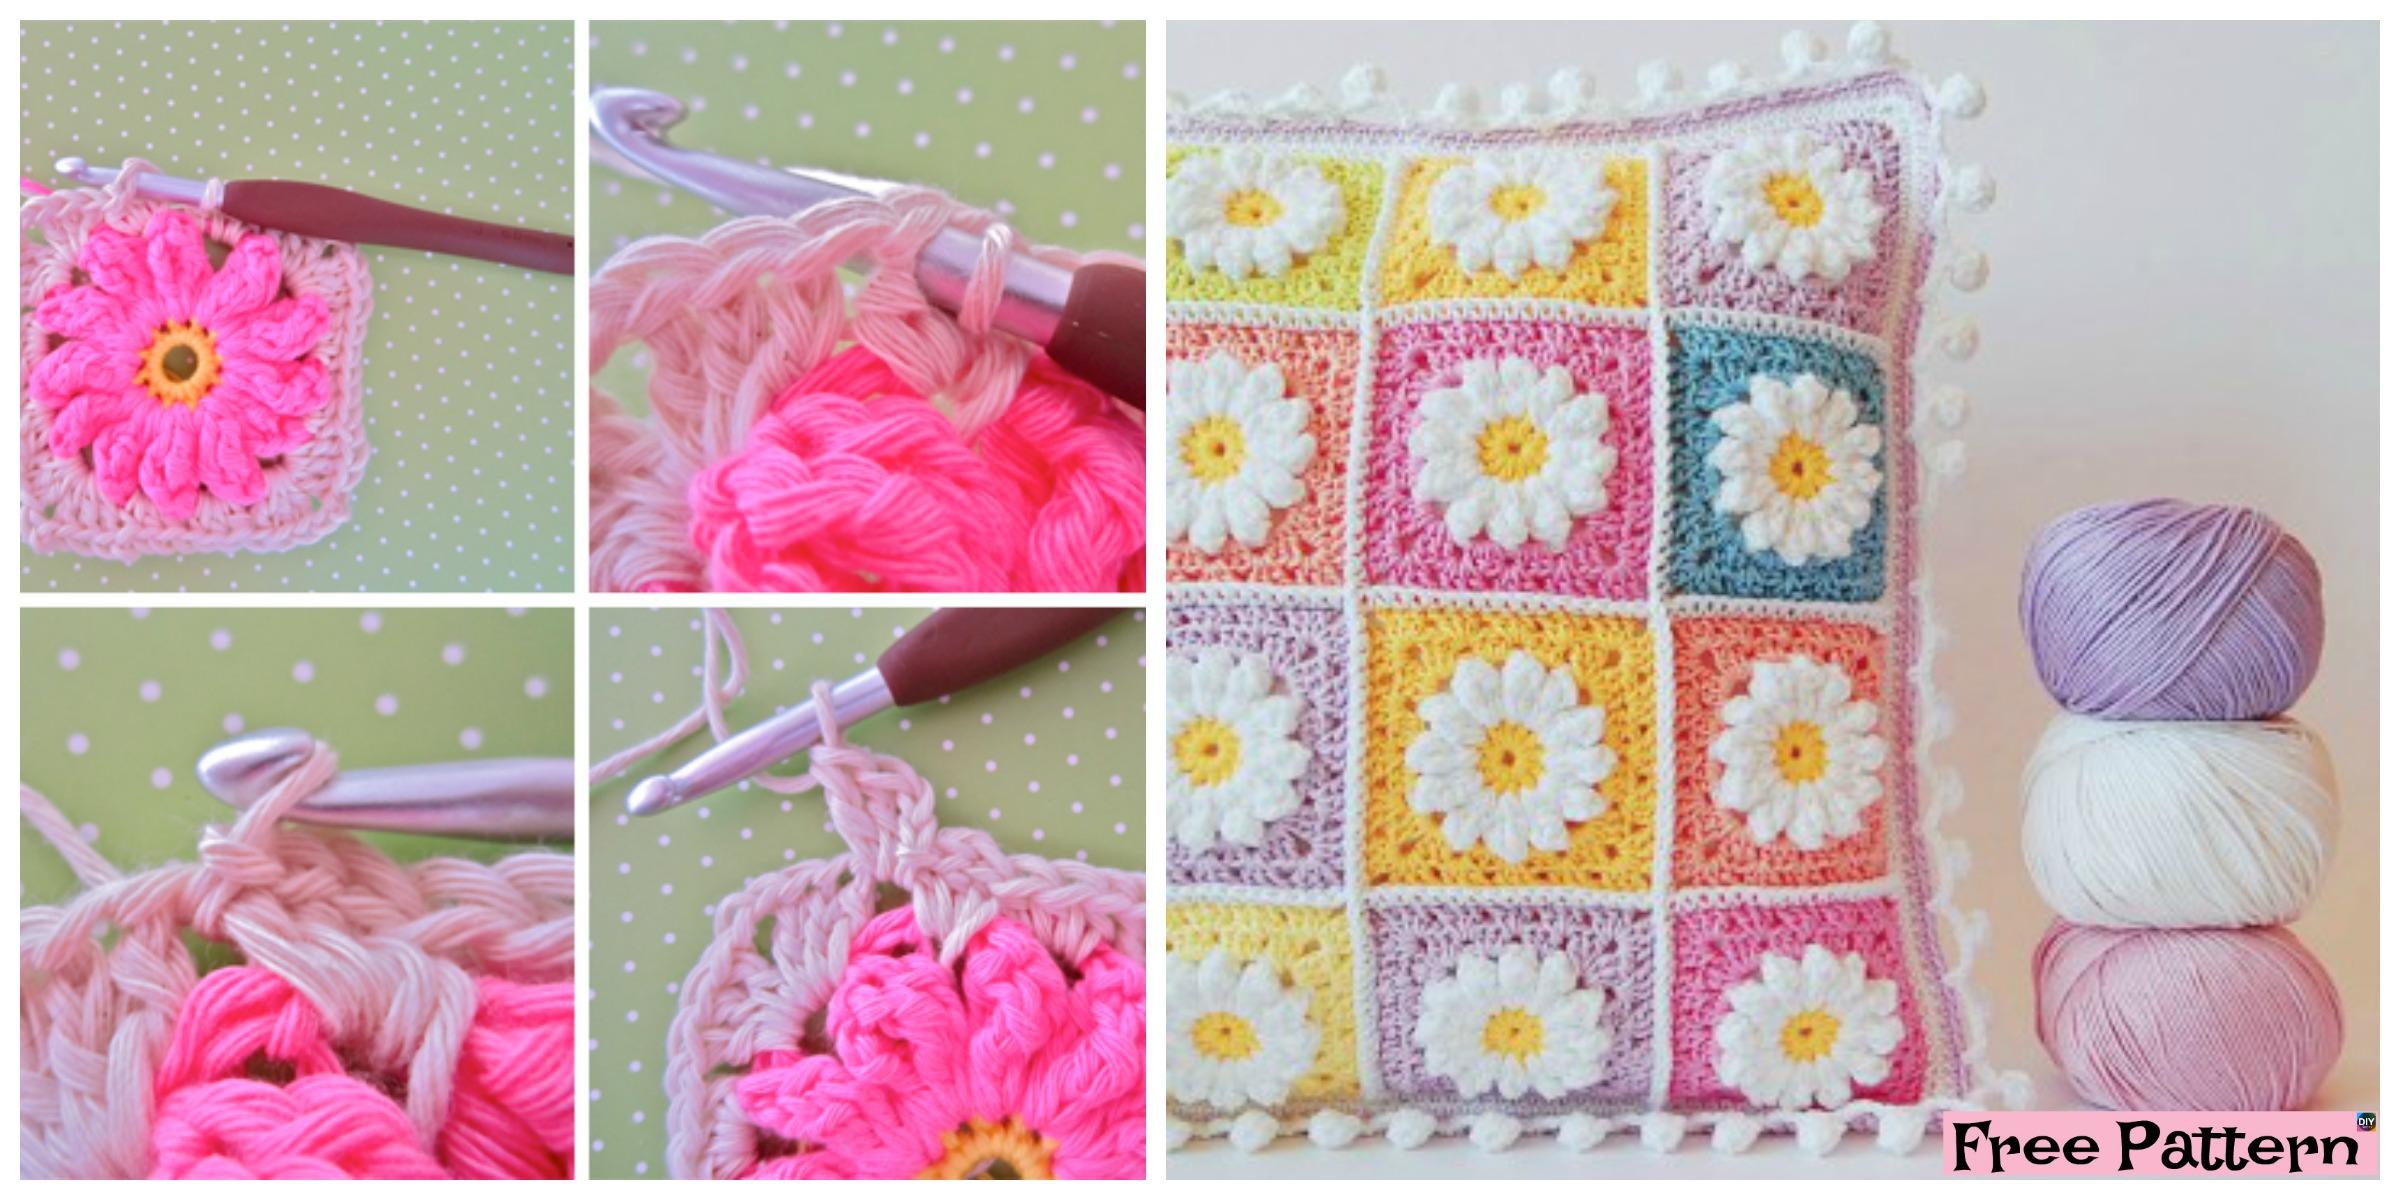 Crochet Daisy Granny Square - Free Pattern - DIY 4 EVER